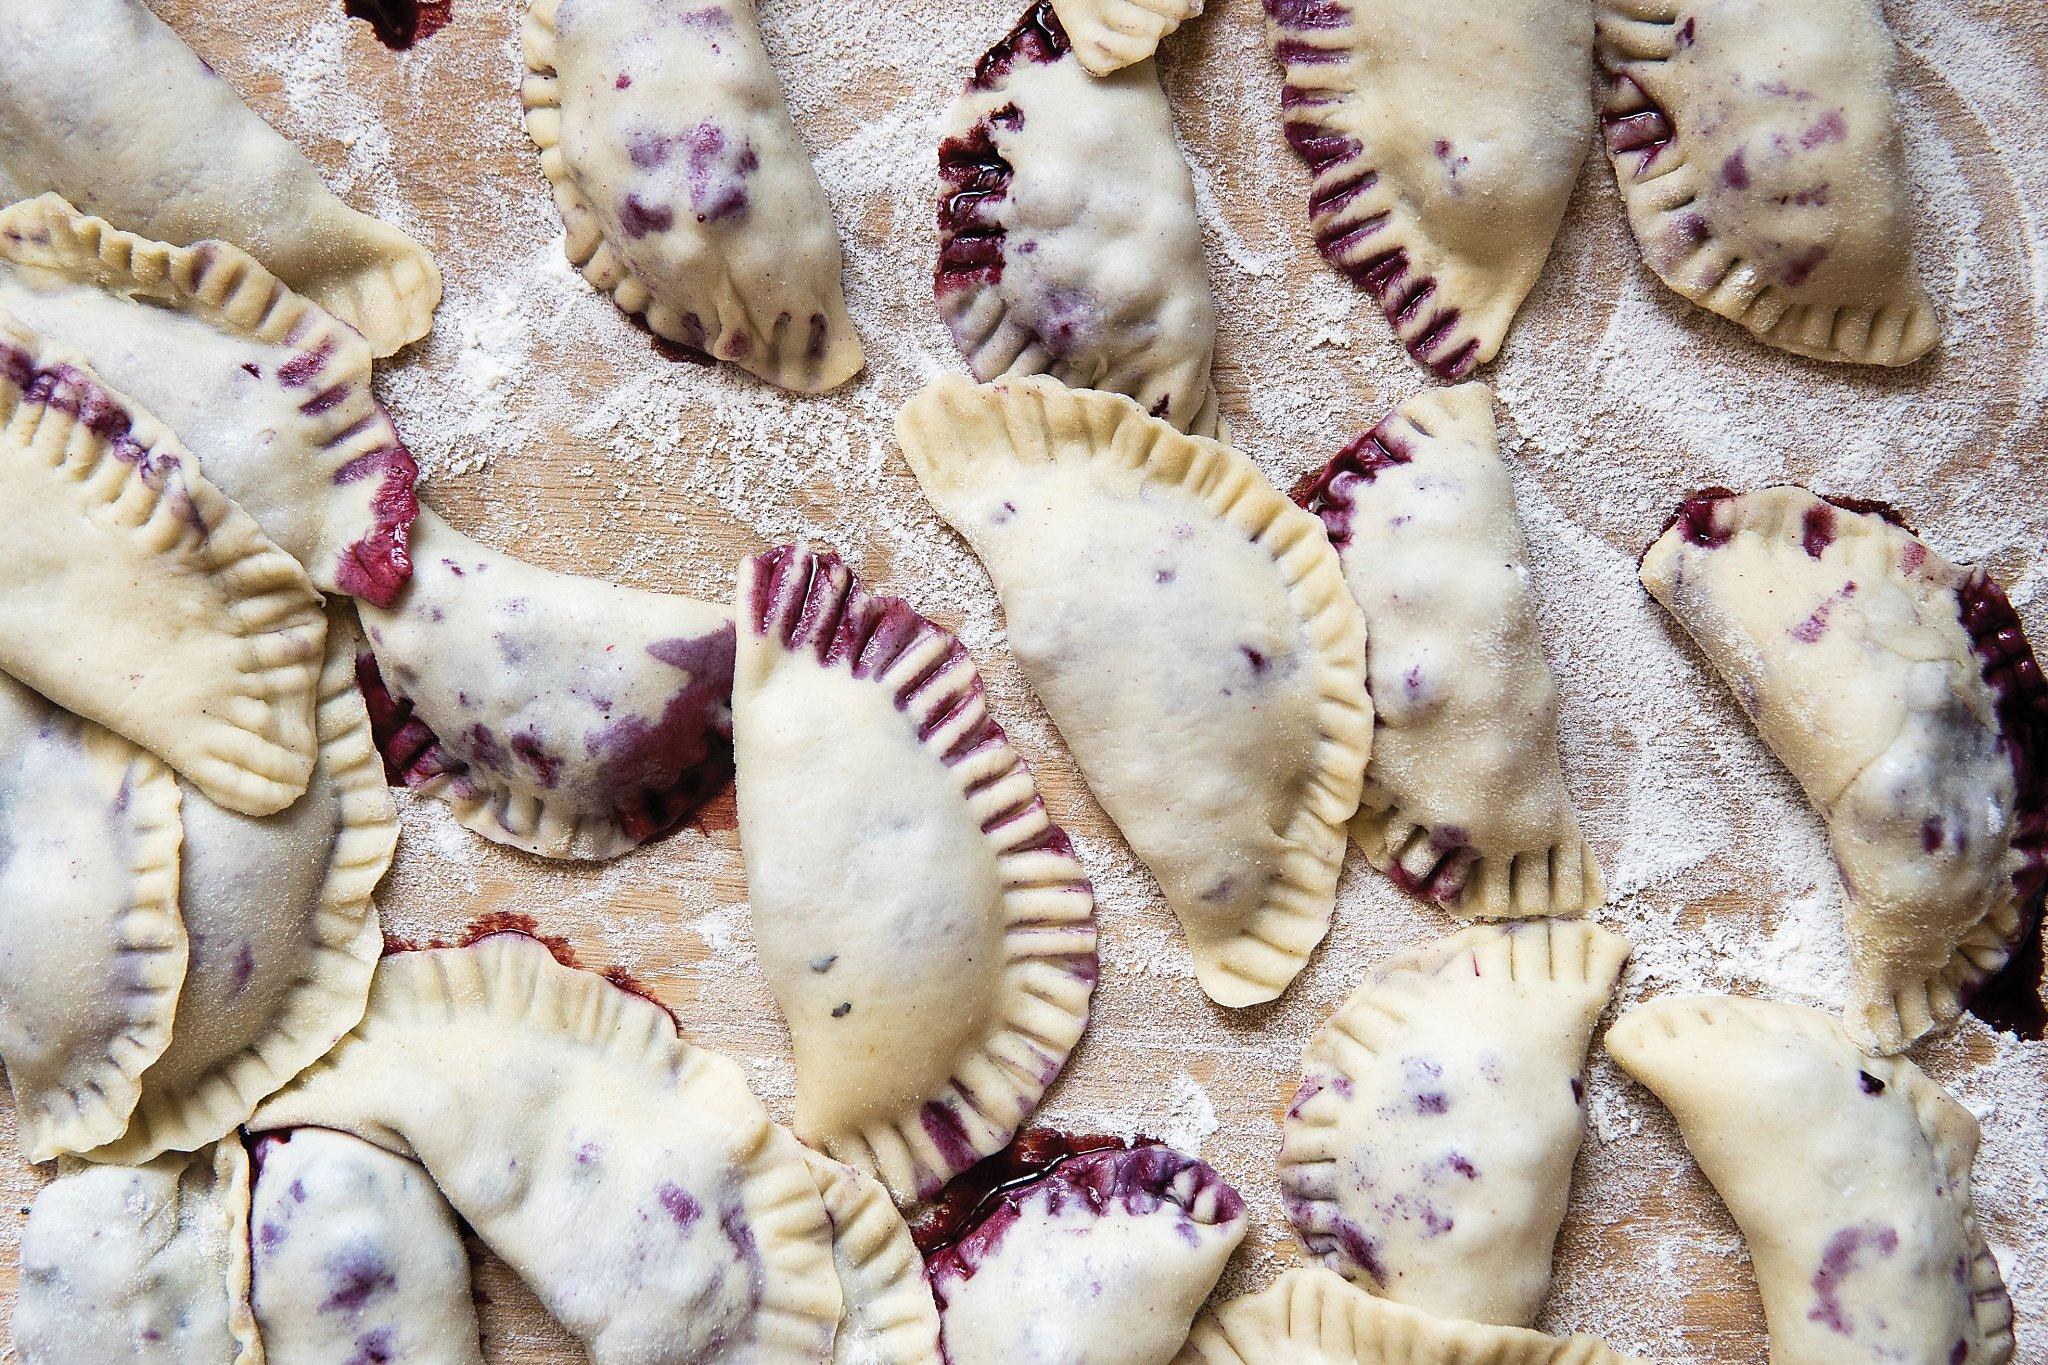 A new Polish cookbook showcases the cuisine as a vegetable wonderland